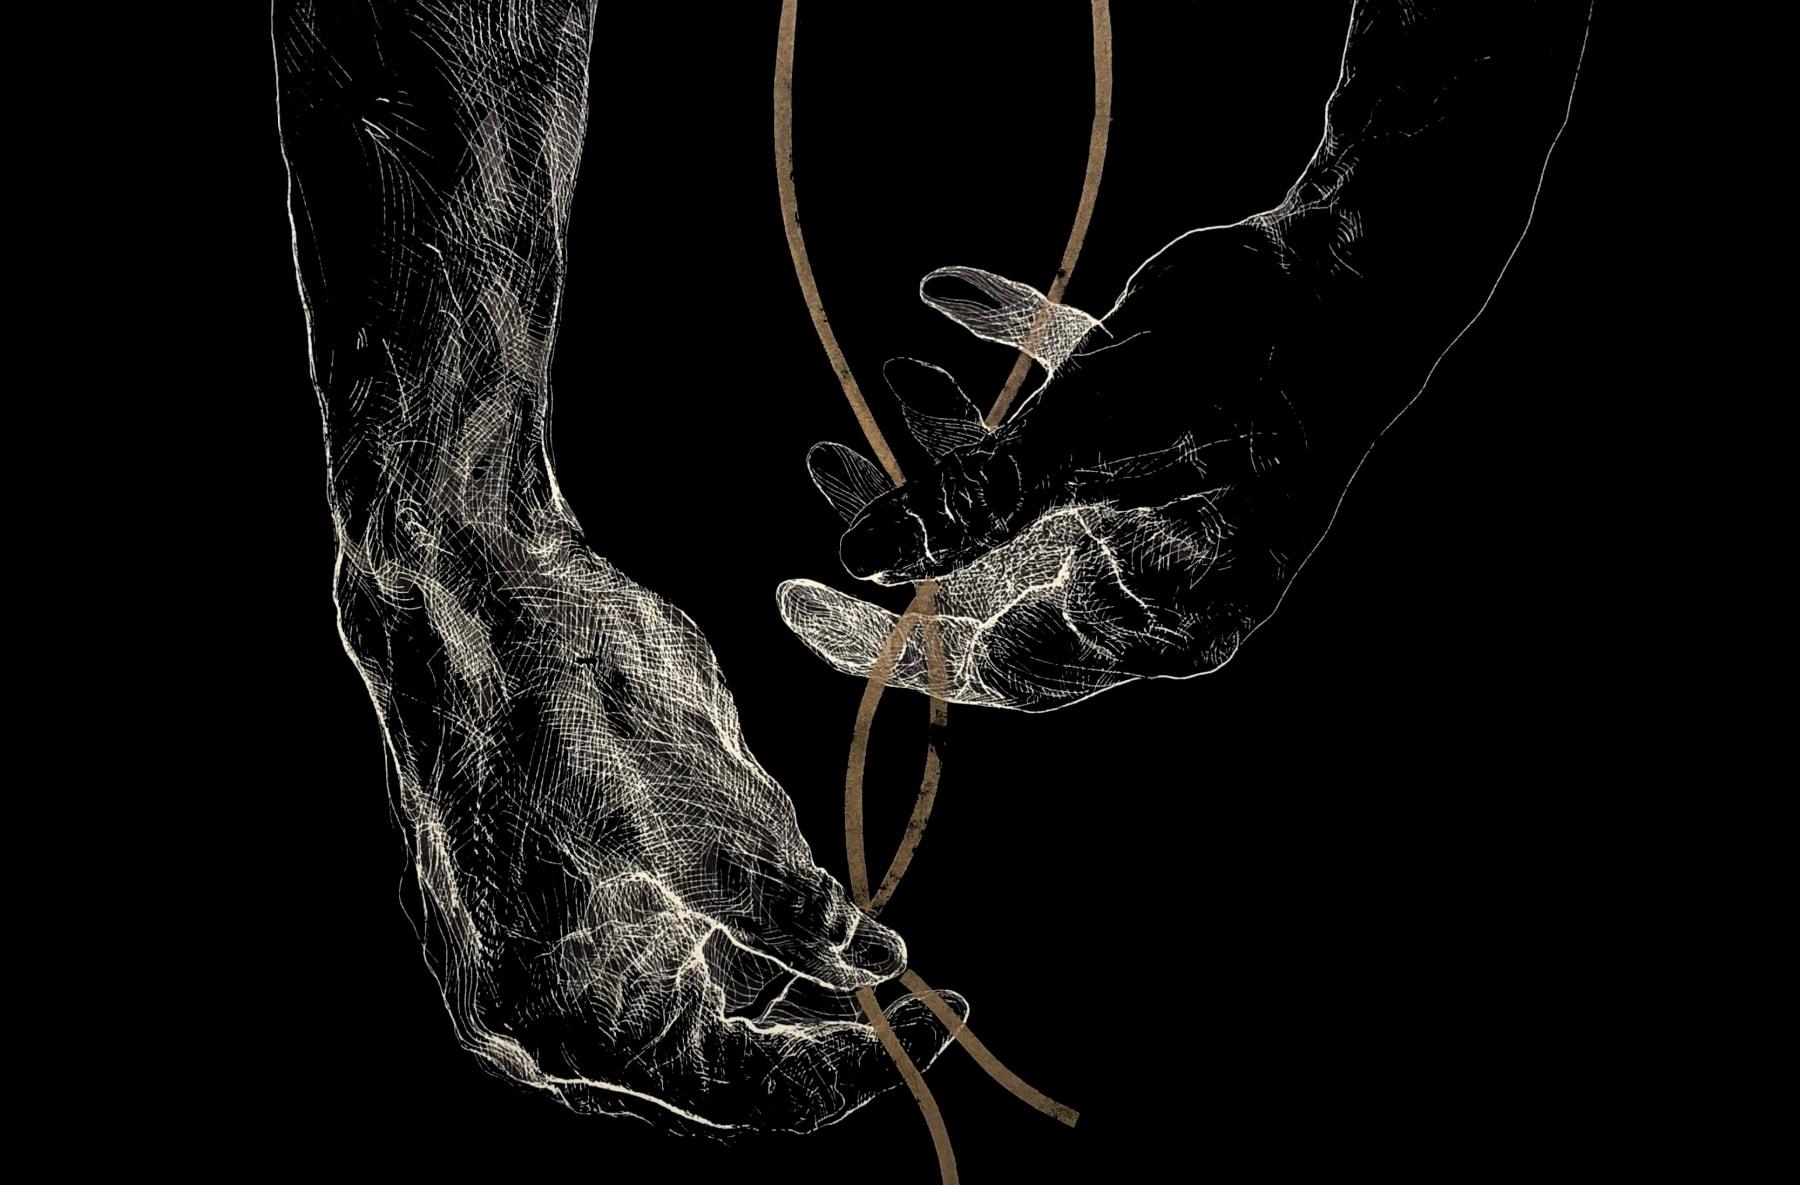 Veta Gorner, Idle Hands, 2020